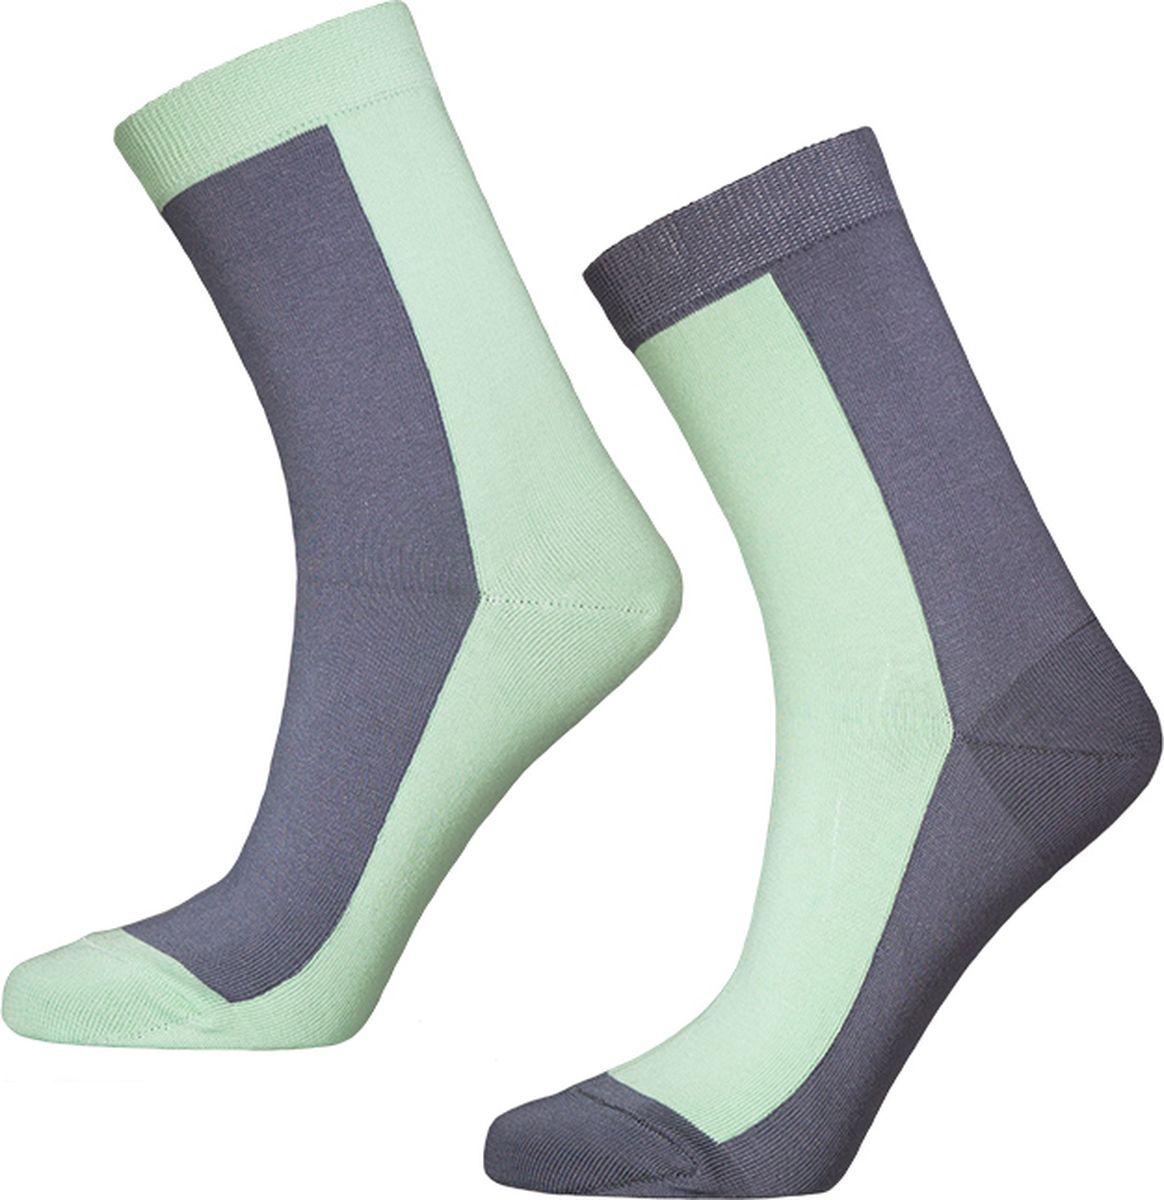 Фото - Носки мужские Big Bang Socks, цвет: мятный, серый, 2 пары. d411. Размер 40/44 genuine leather men travel bags luggage women fashion totes big bag male crossbody business shoulder handbag